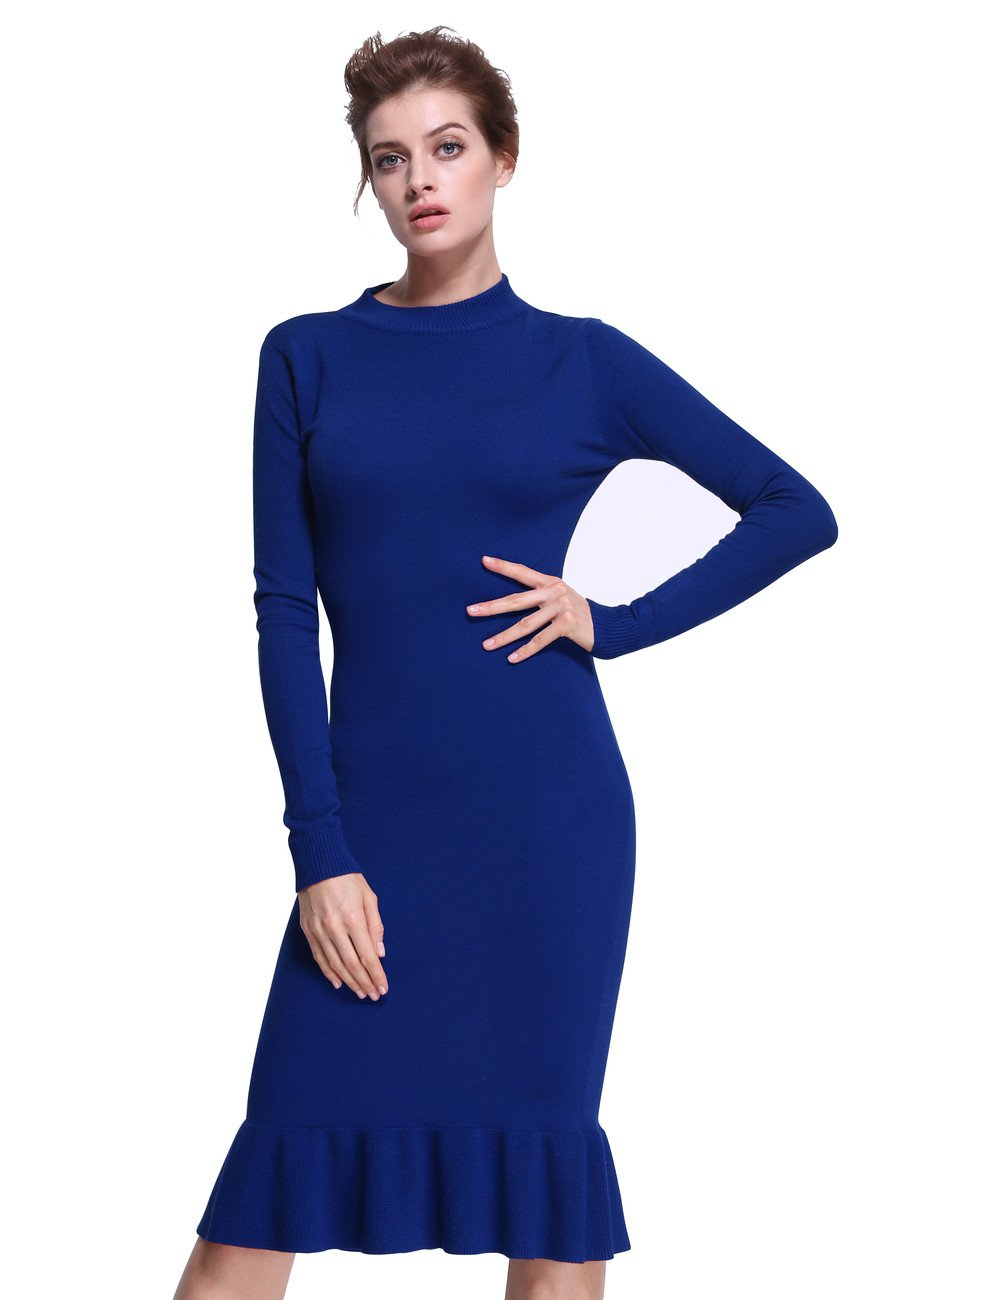 ninovino Women's Mock Neck Long Sleeve Mermaid Bodyon Dress Blue-M